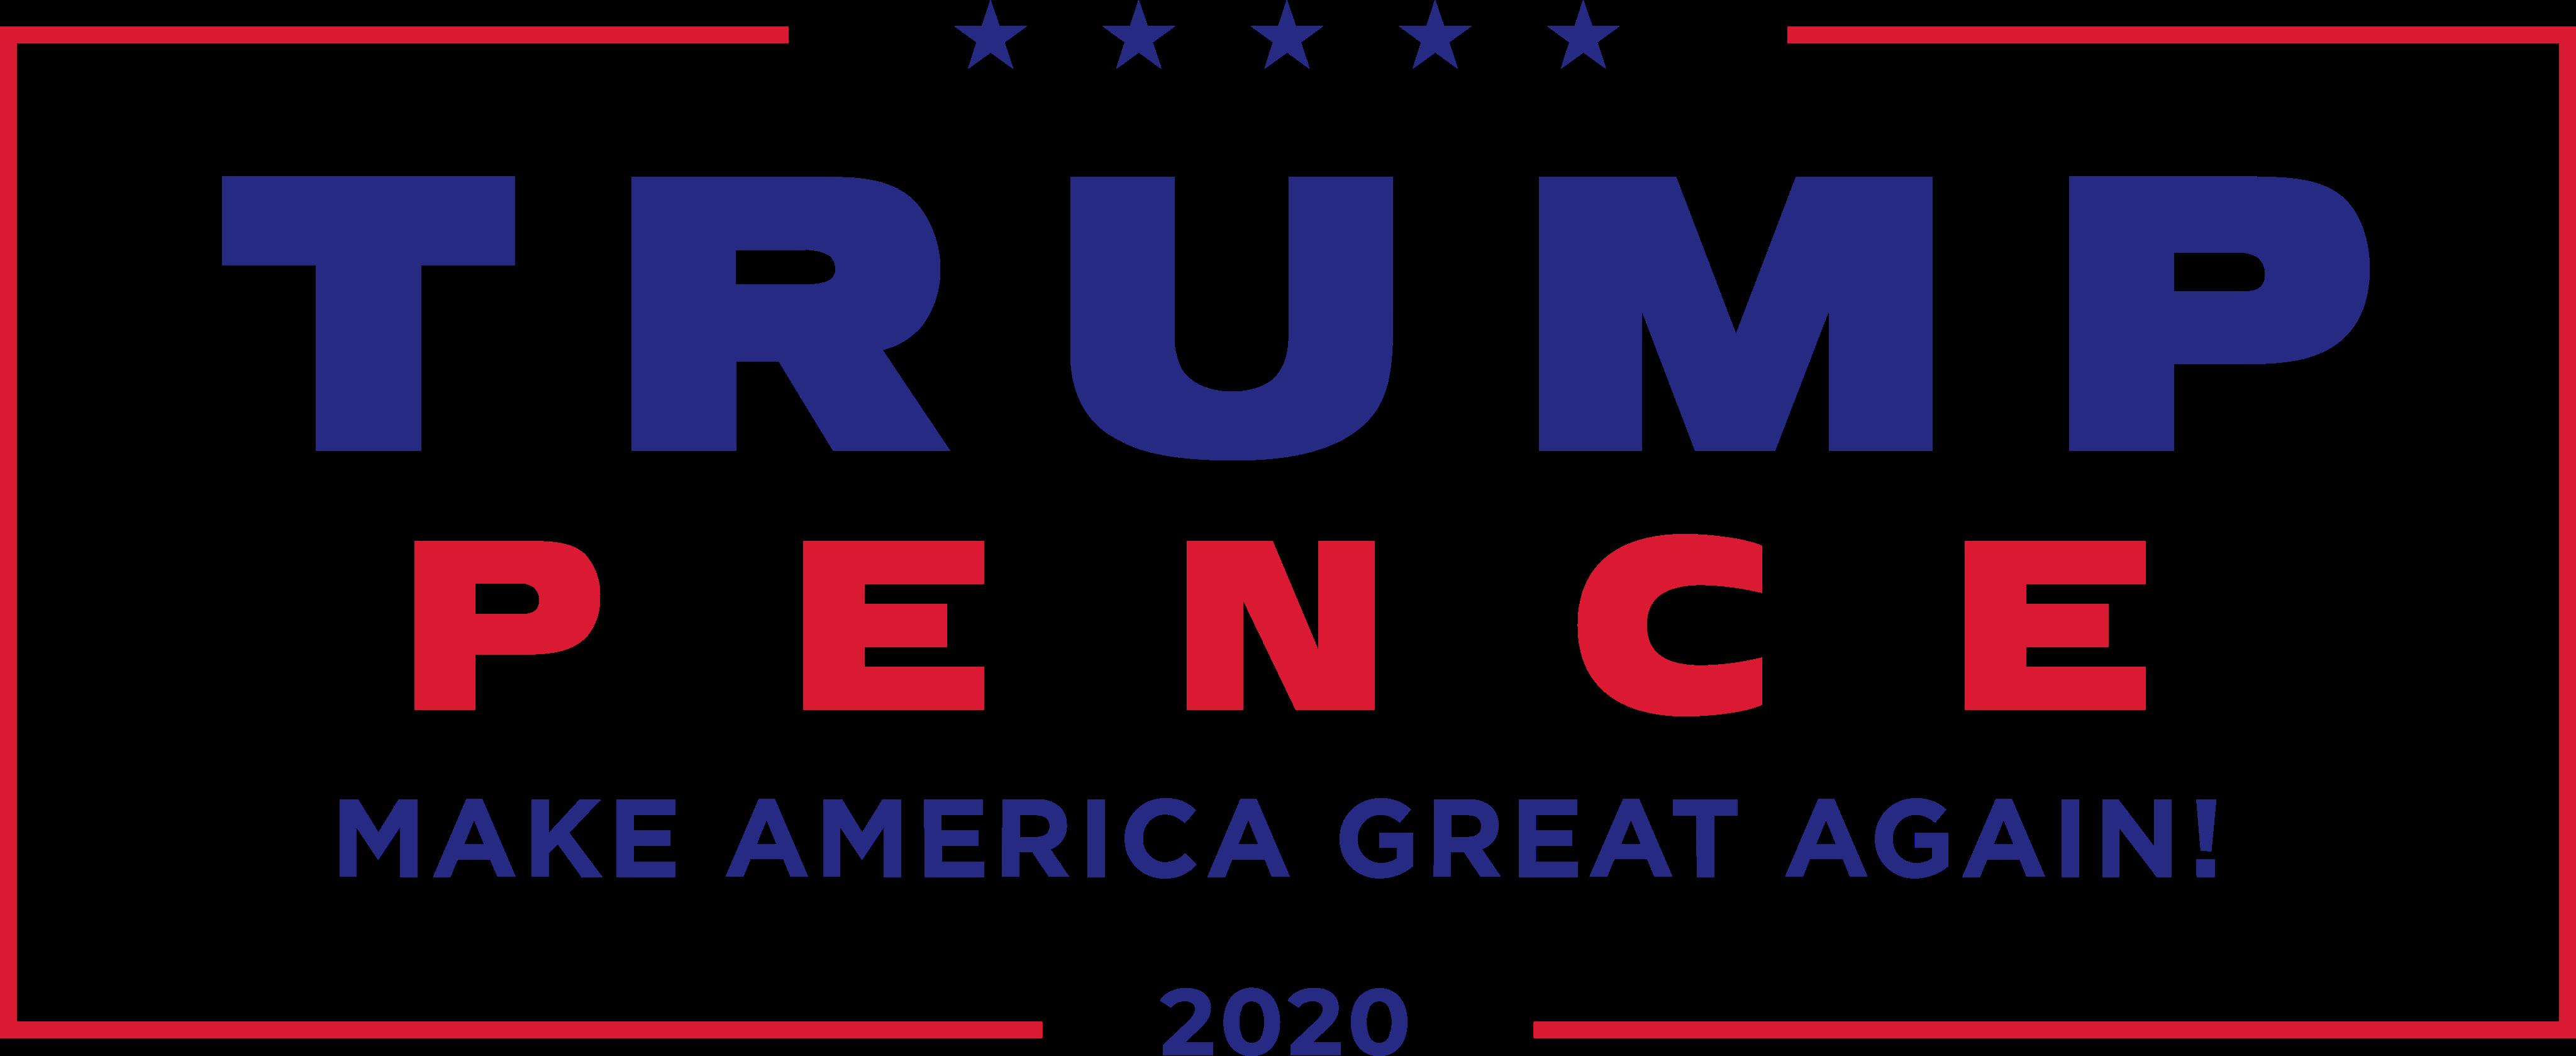 trump president 2020 logo - Trump President 2020 Logo